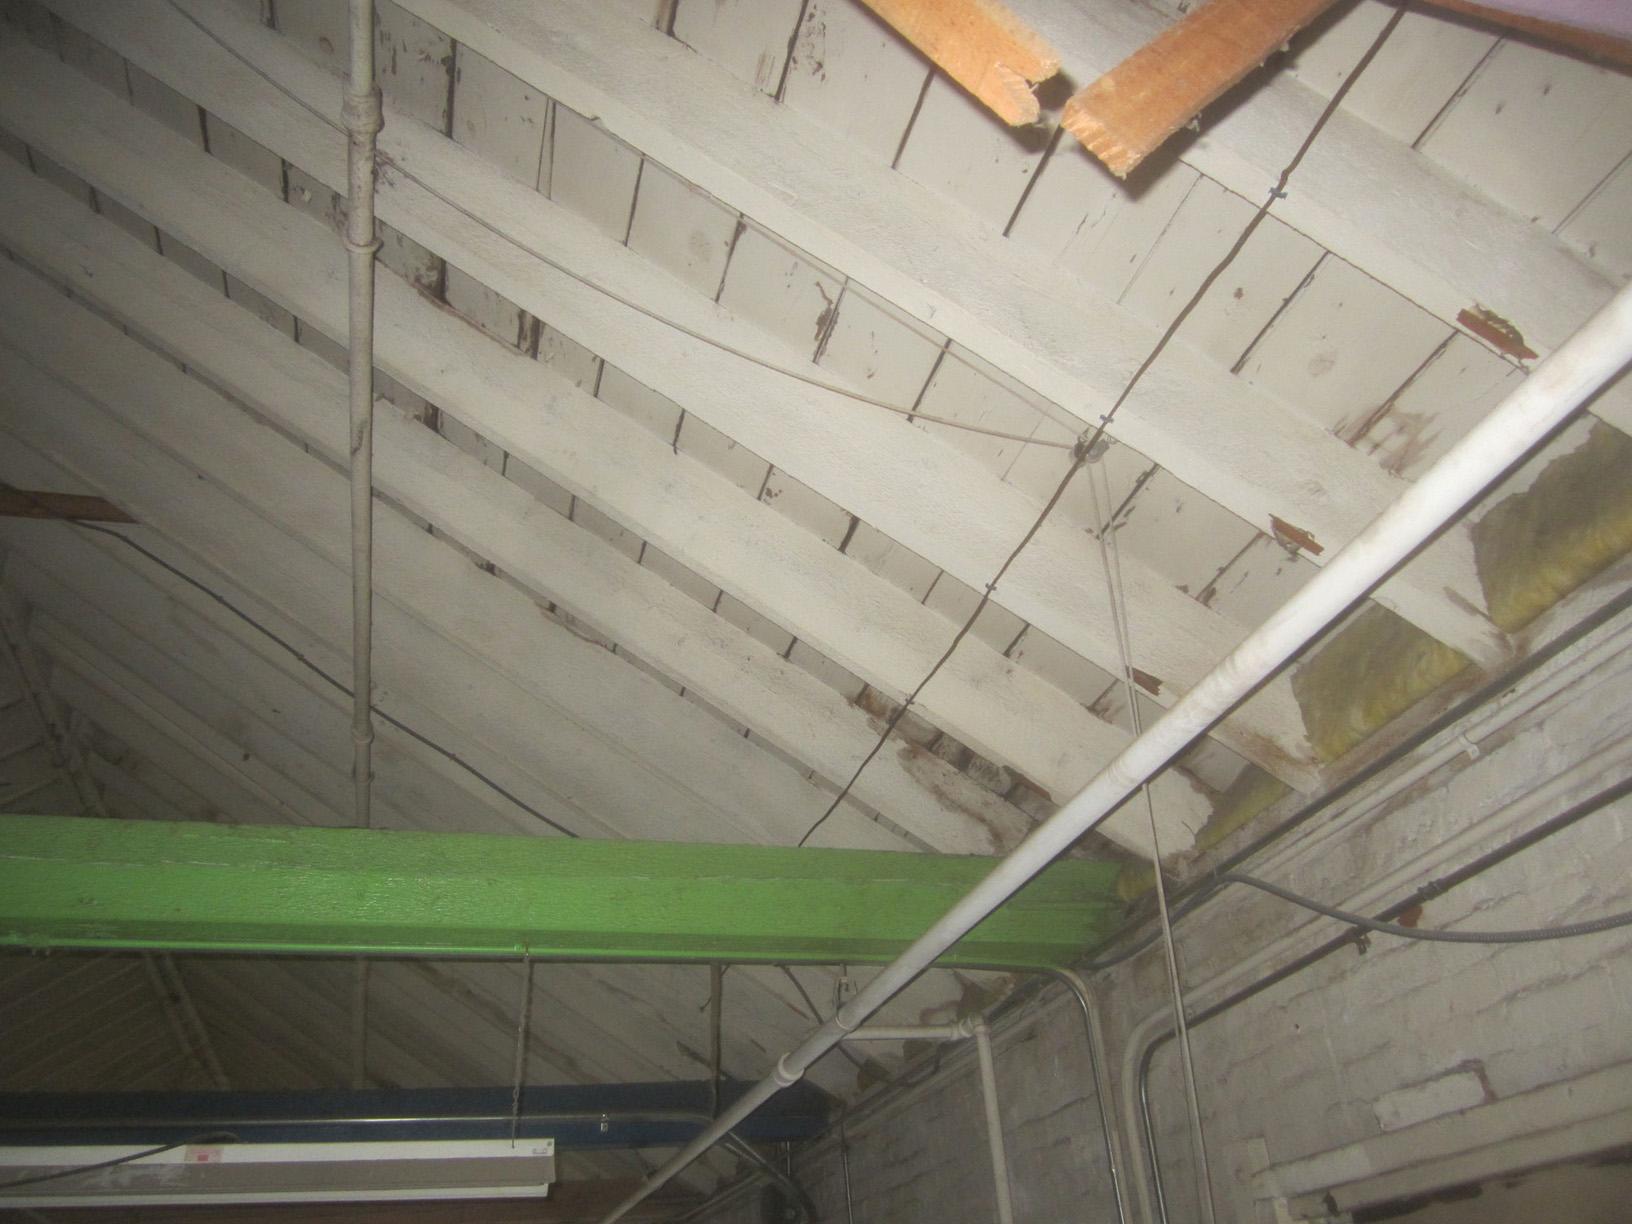 Holyoke_spray foam insulation, closed cell